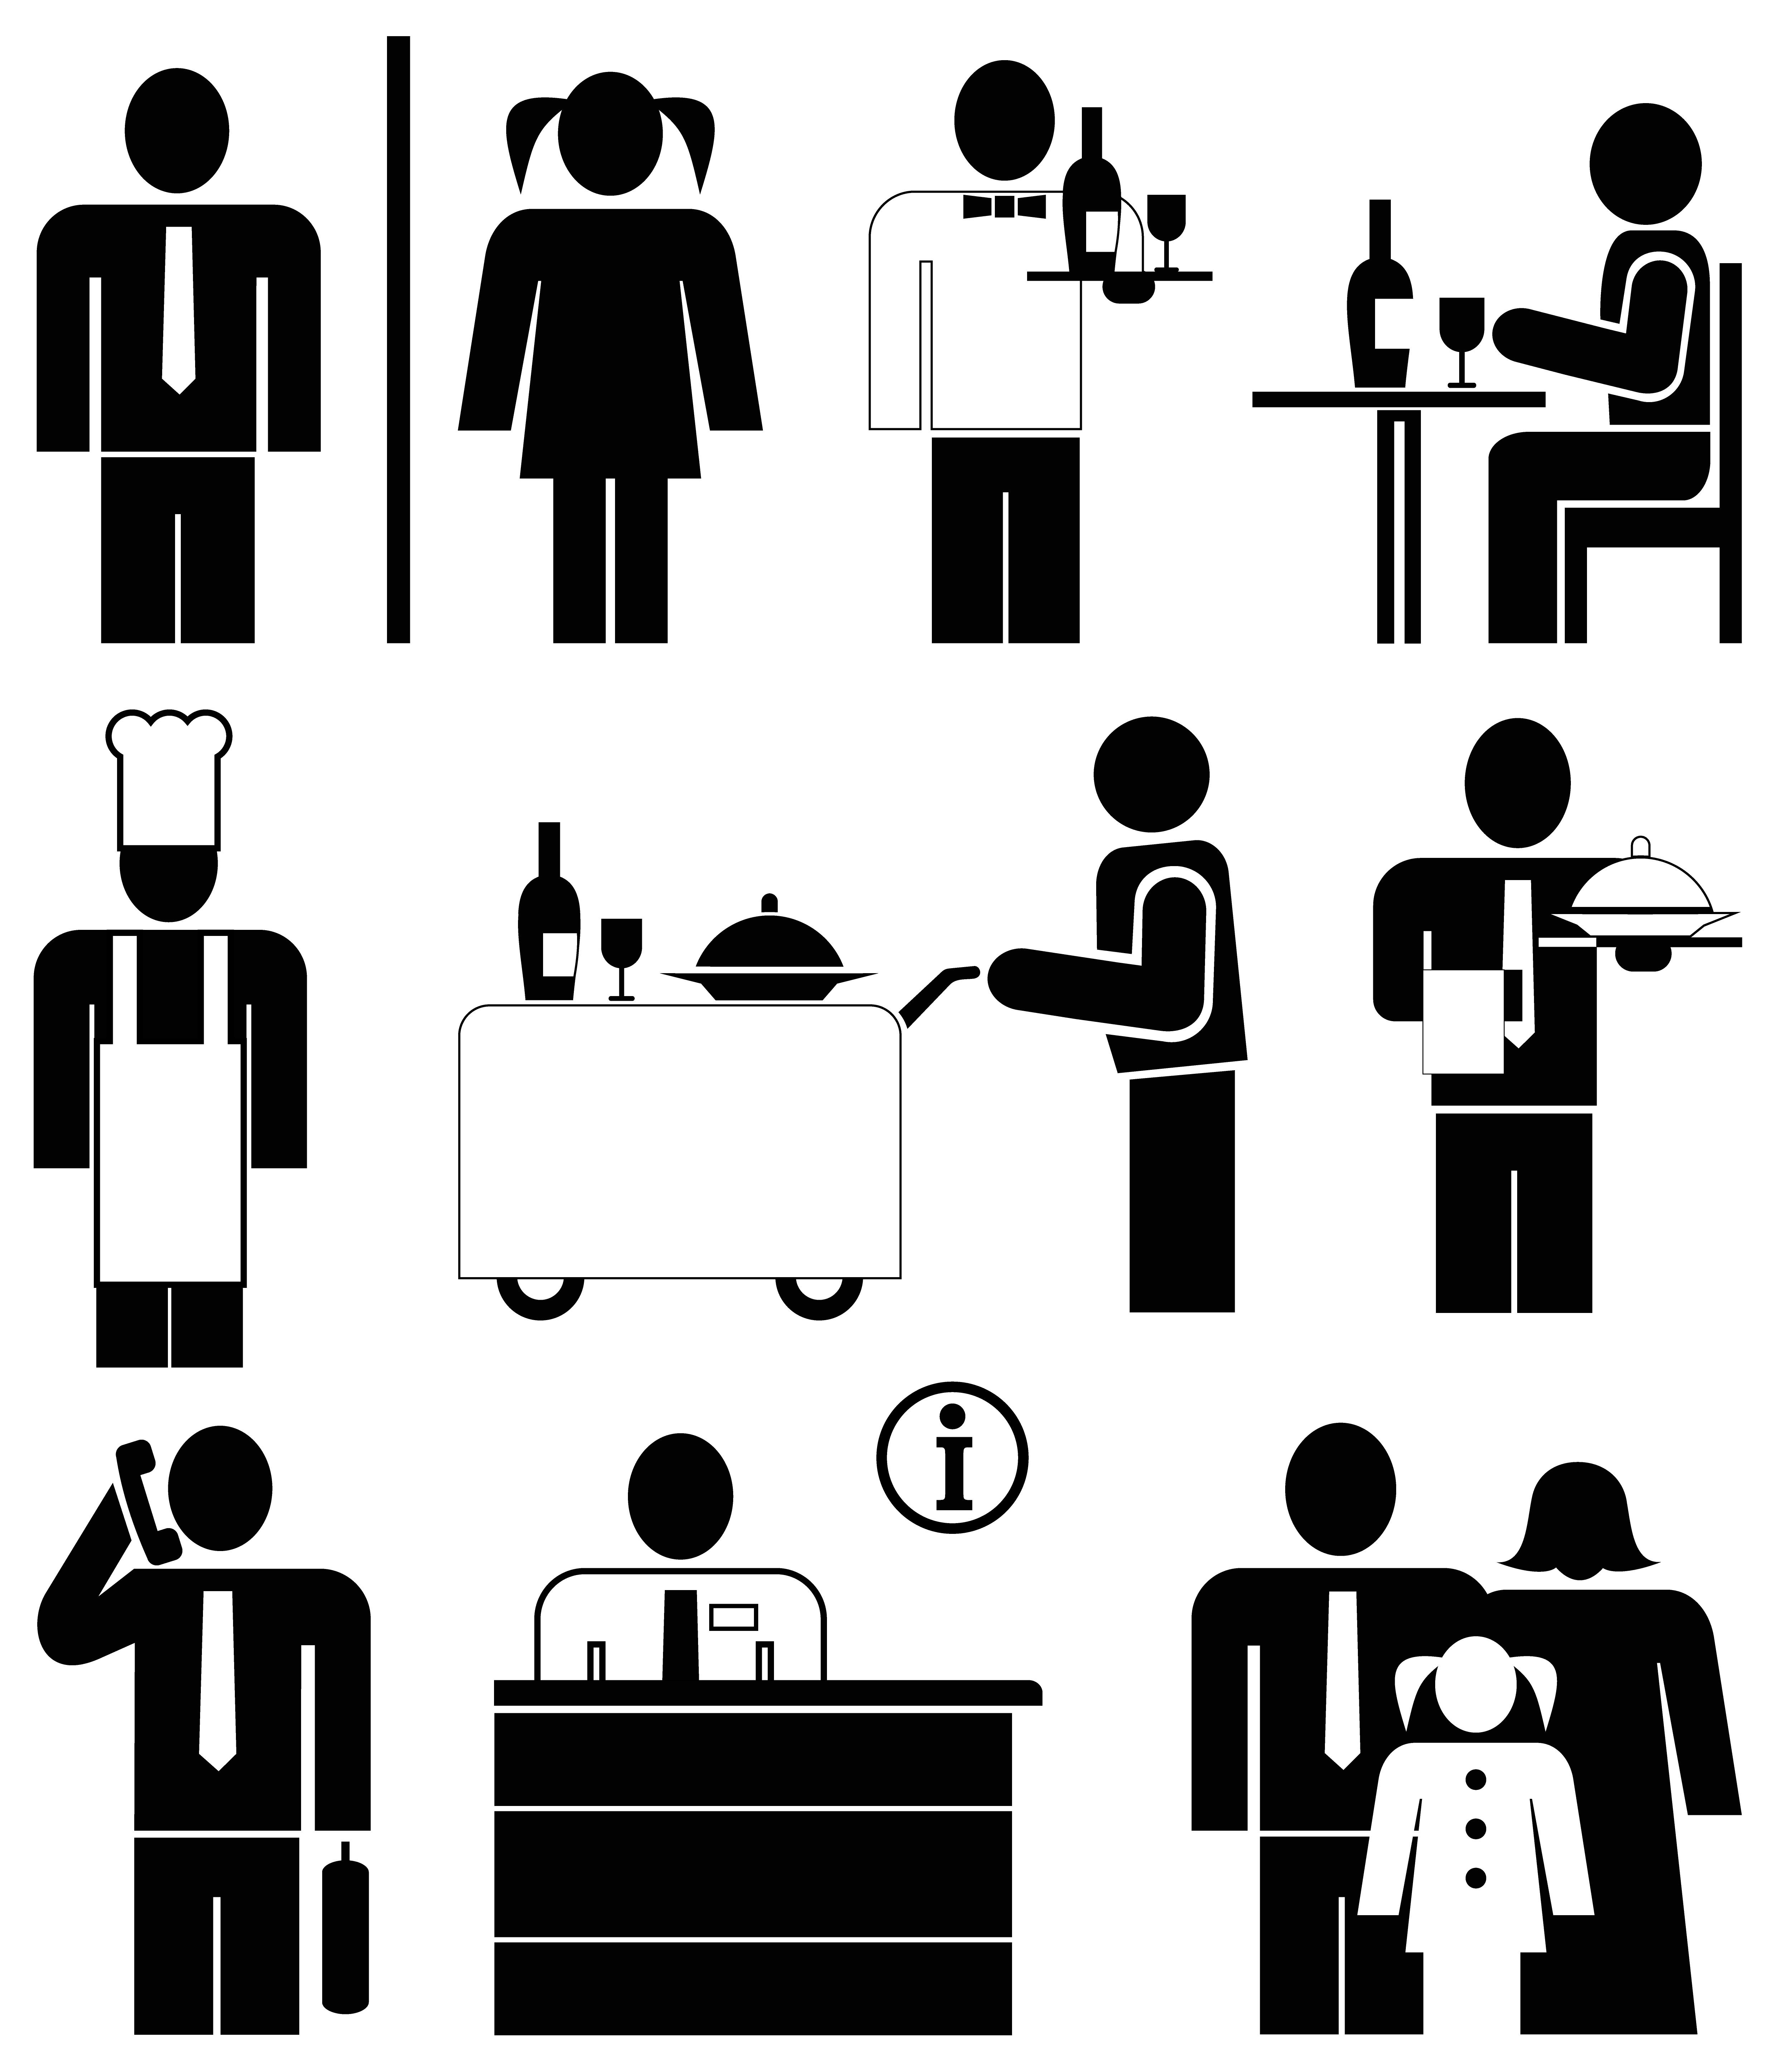 Restaurant icons.